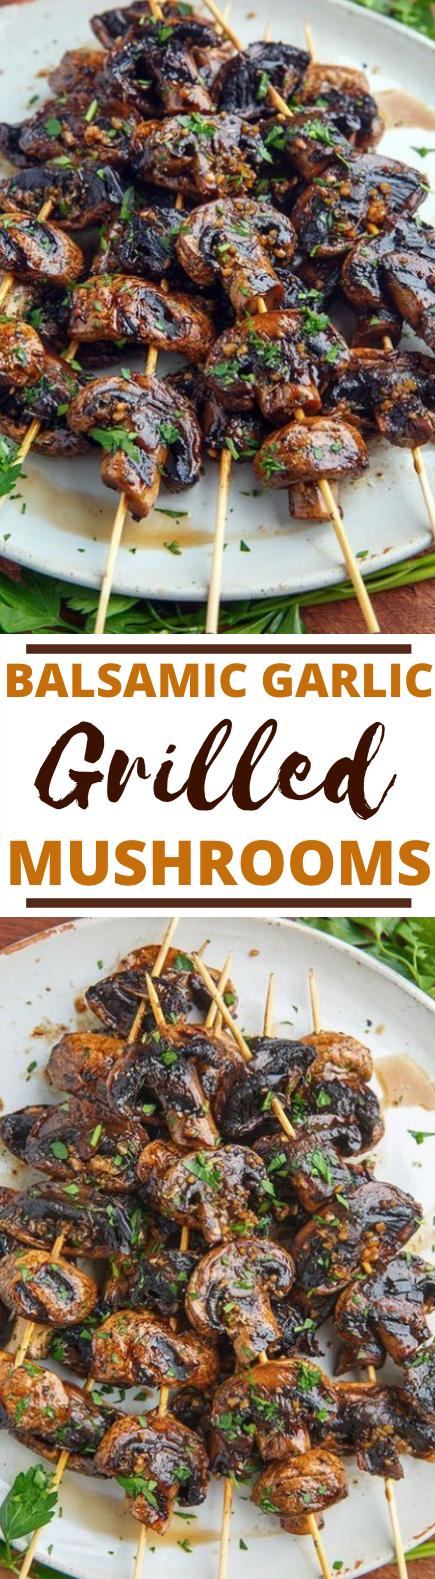 Balsamic Garlic Grilled Mushroom Skewers #vegan #recipes #sidedish #mushroom #grilling